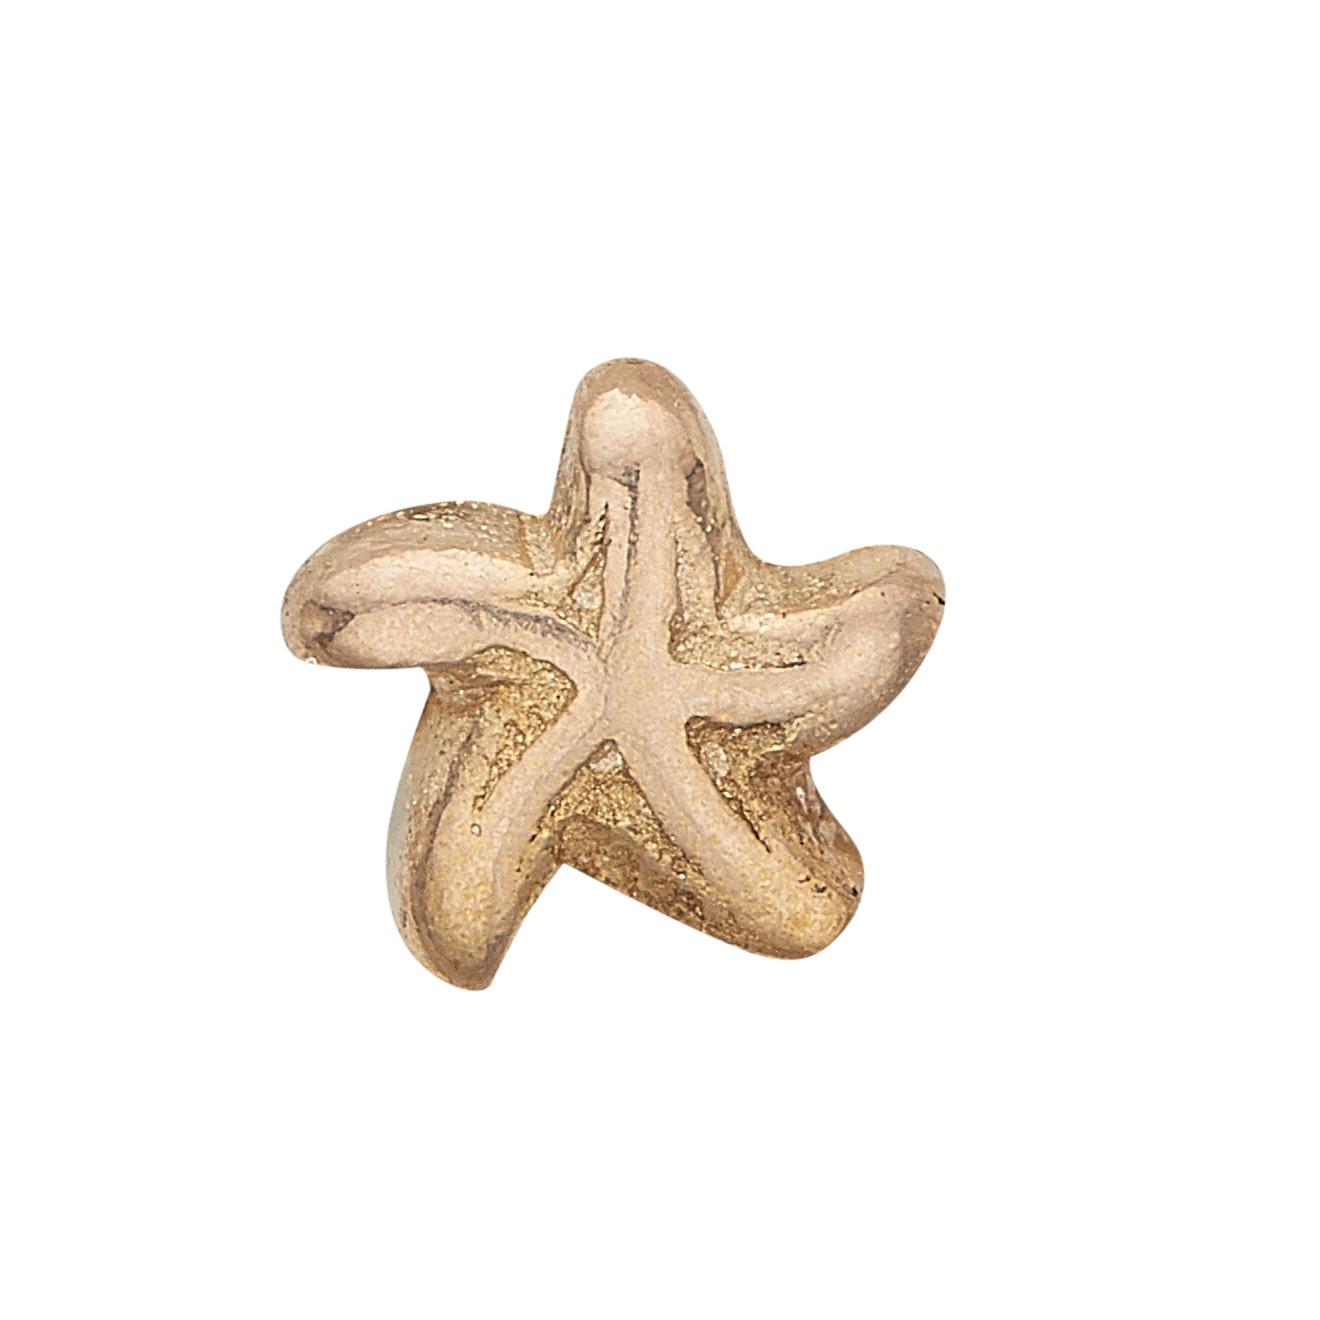 christina watches – Christina collect starfish - 603-g7 fra brodersen + kobborg